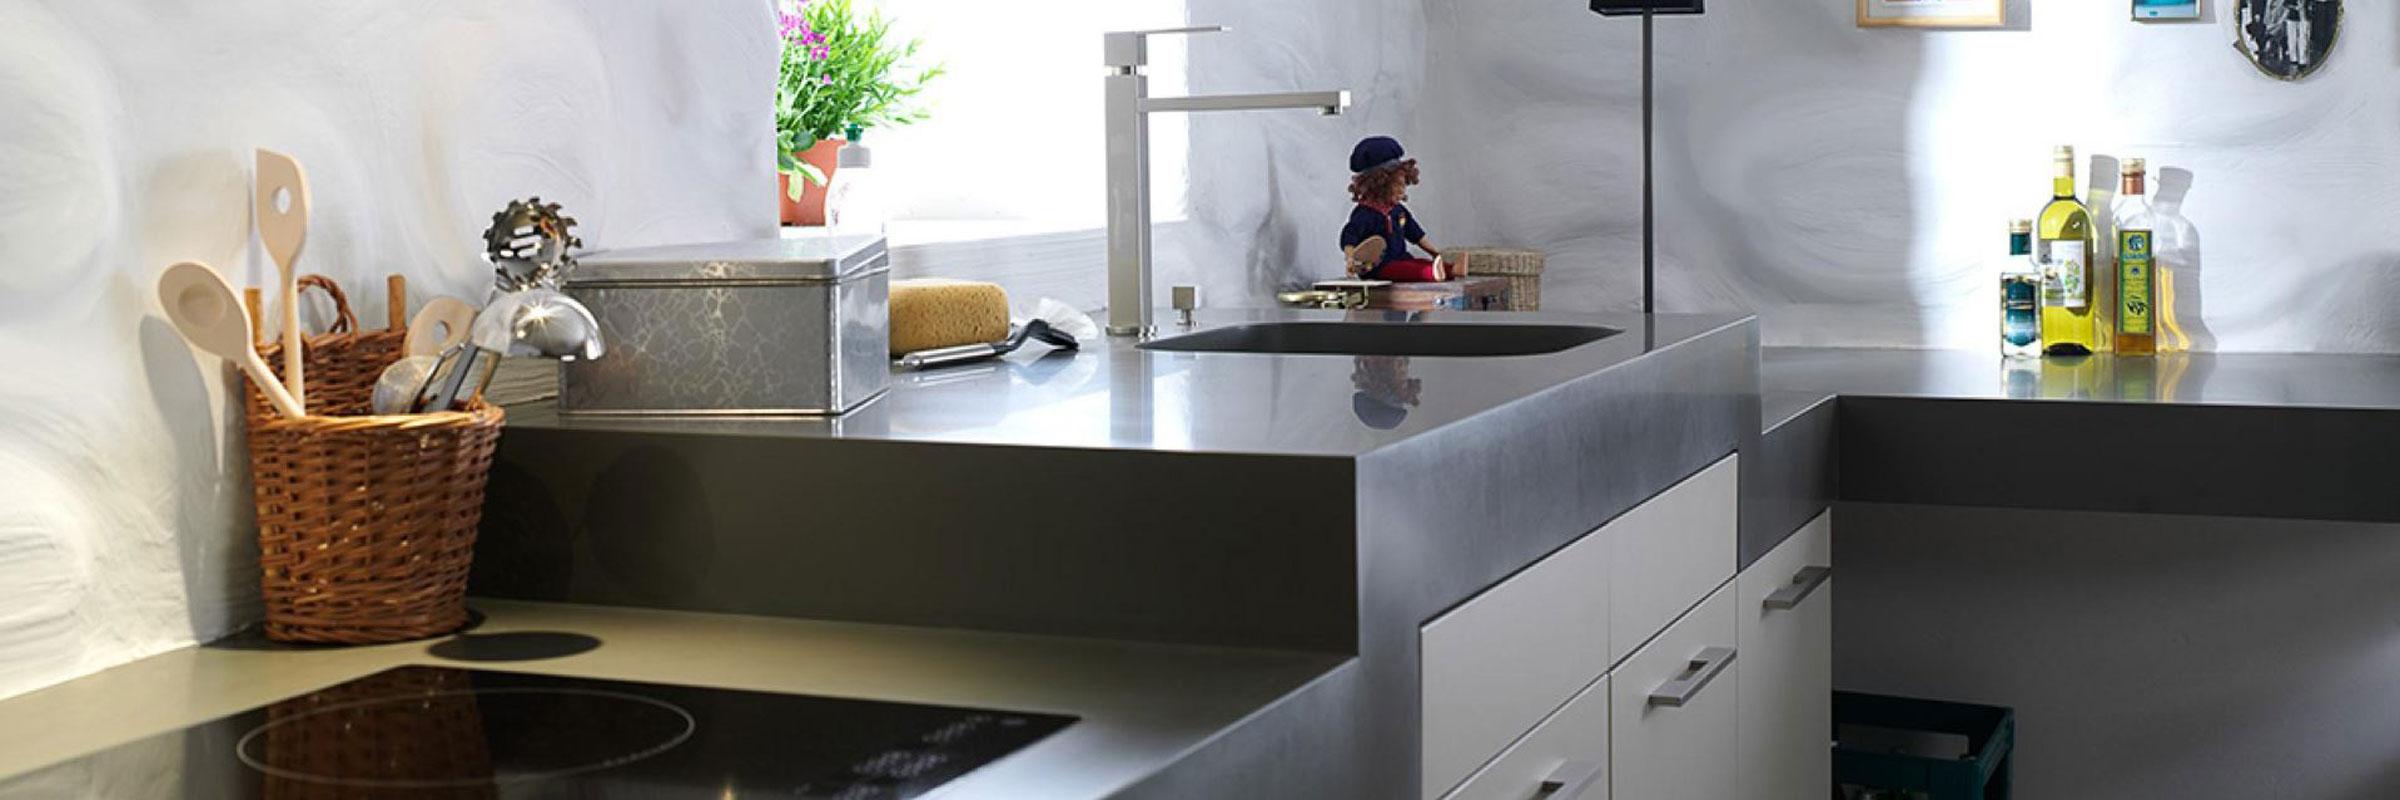 futuristic-clean-grey-kitchen-surface-concept